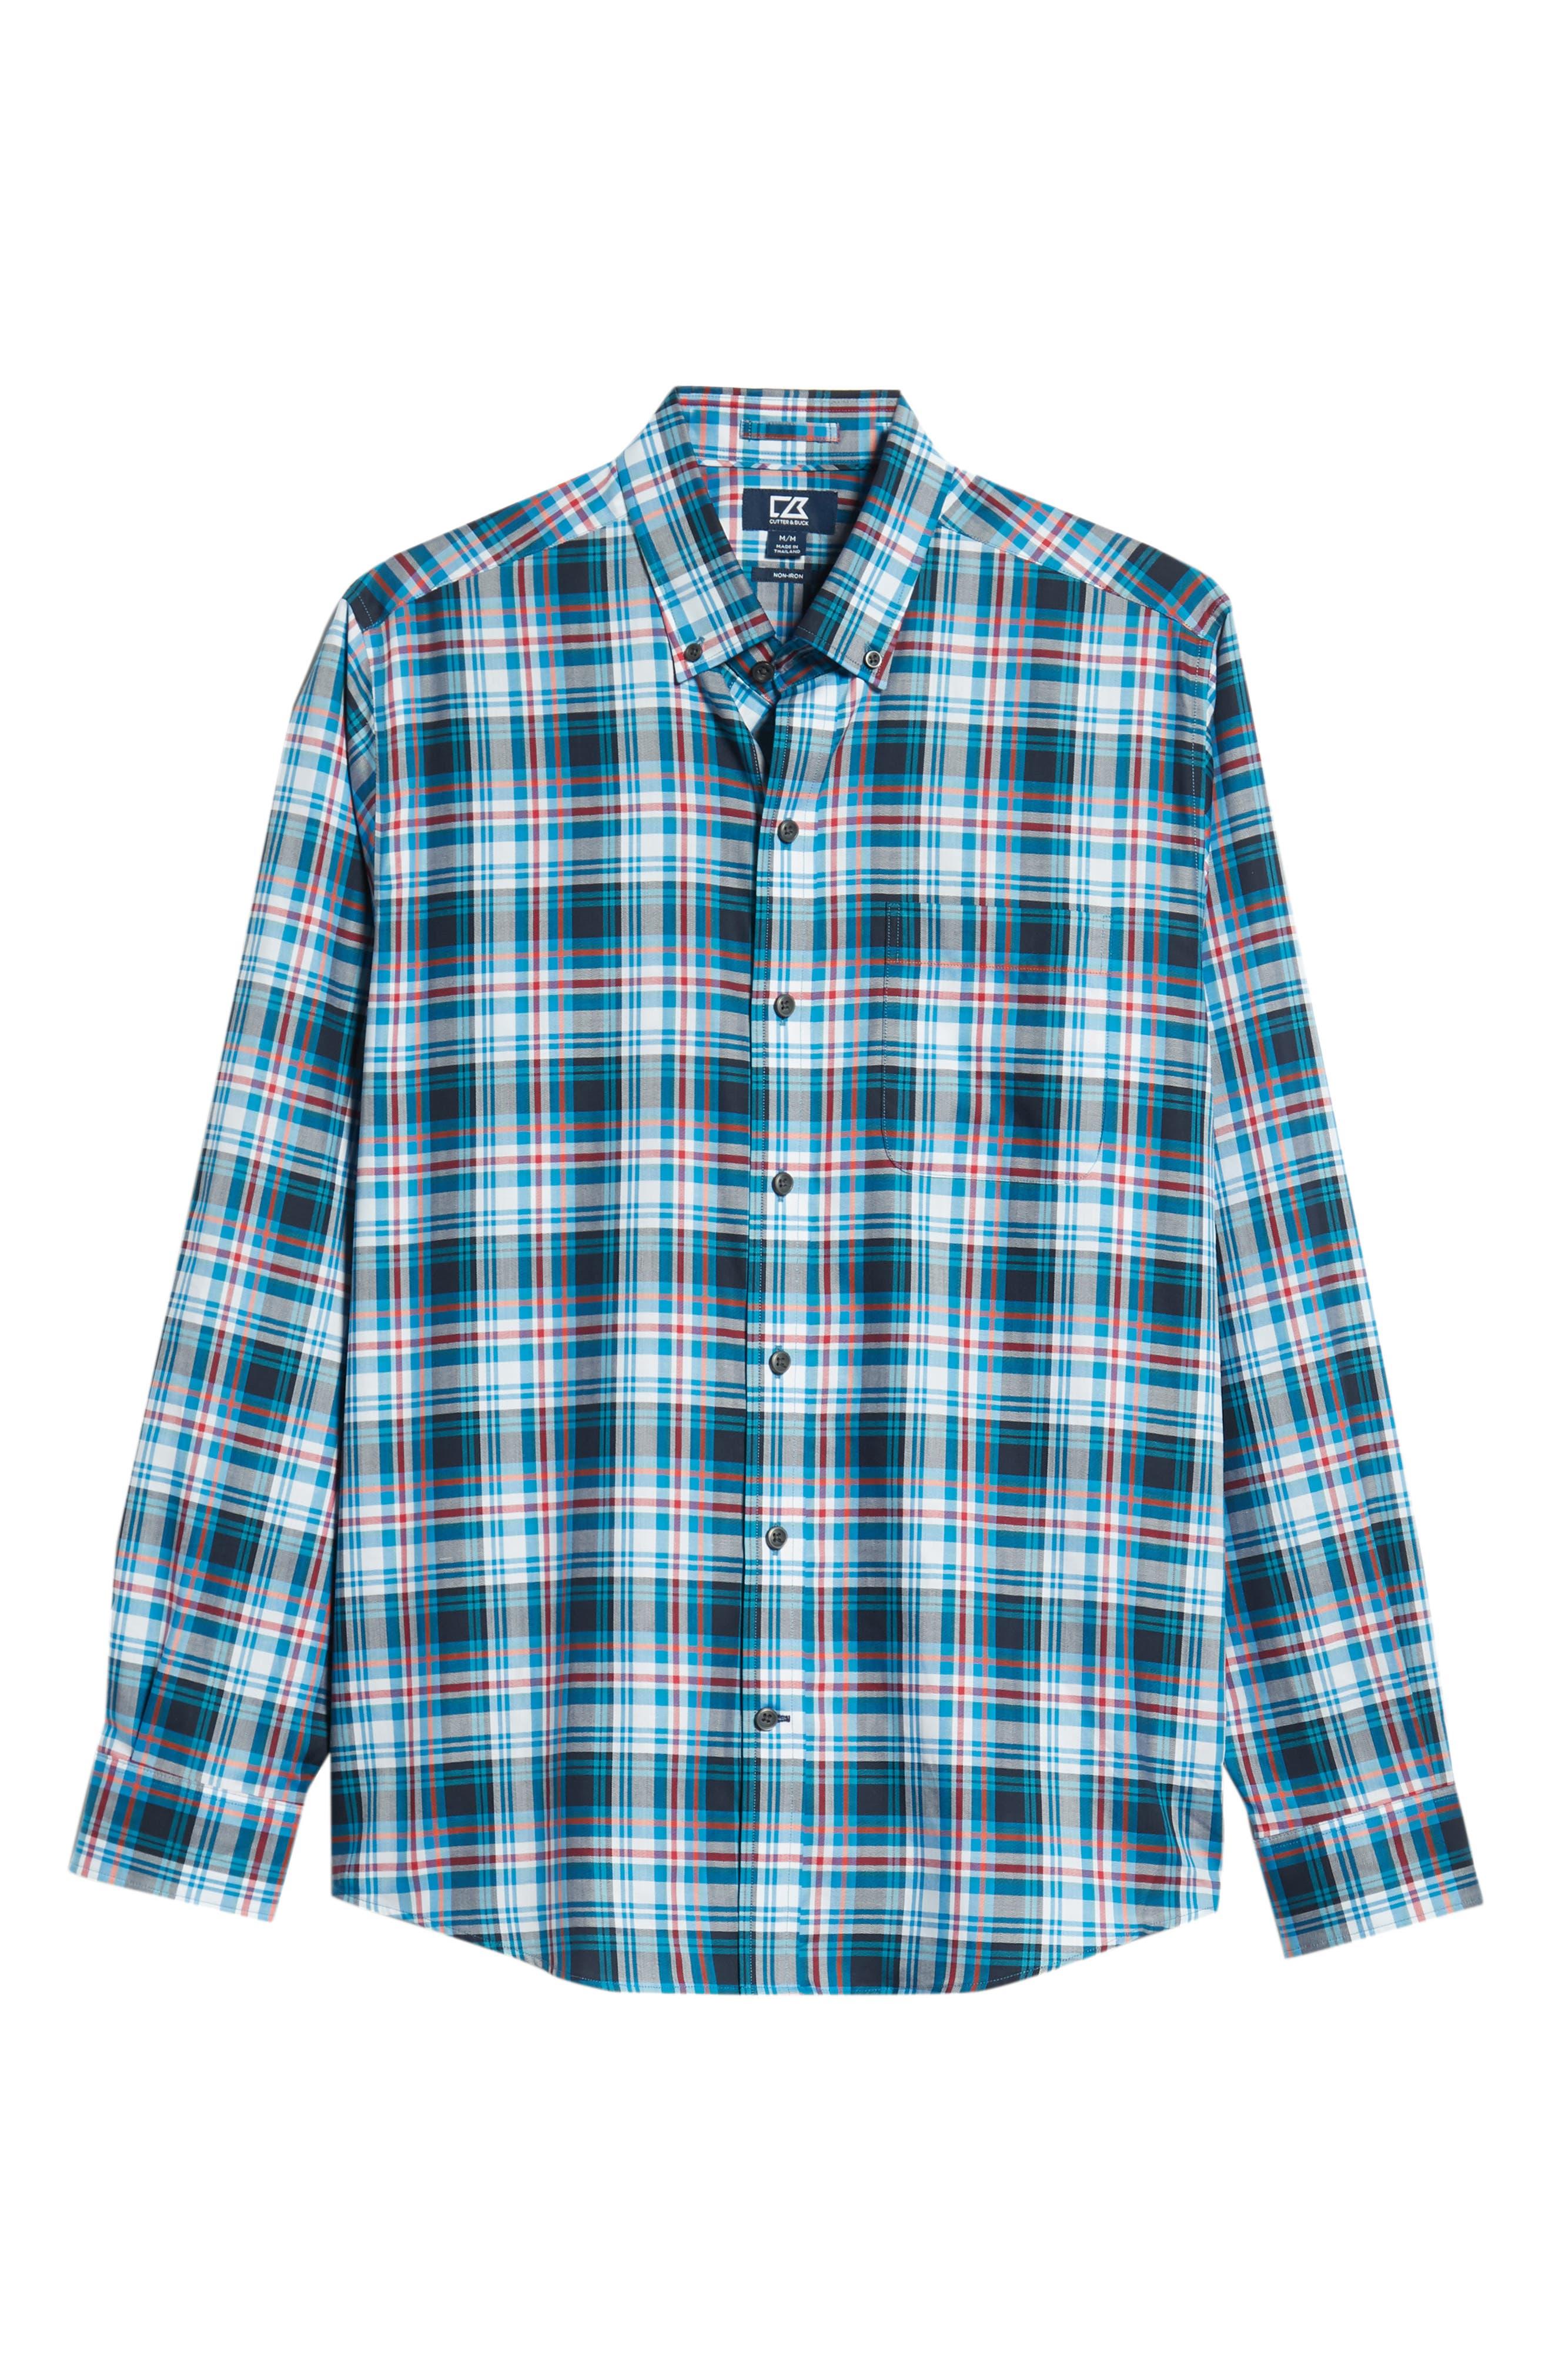 Brad Regular Fit Non-Iron Plaid Sport Shirt,                             Alternate thumbnail 5, color,                             LIBERTY NAVY